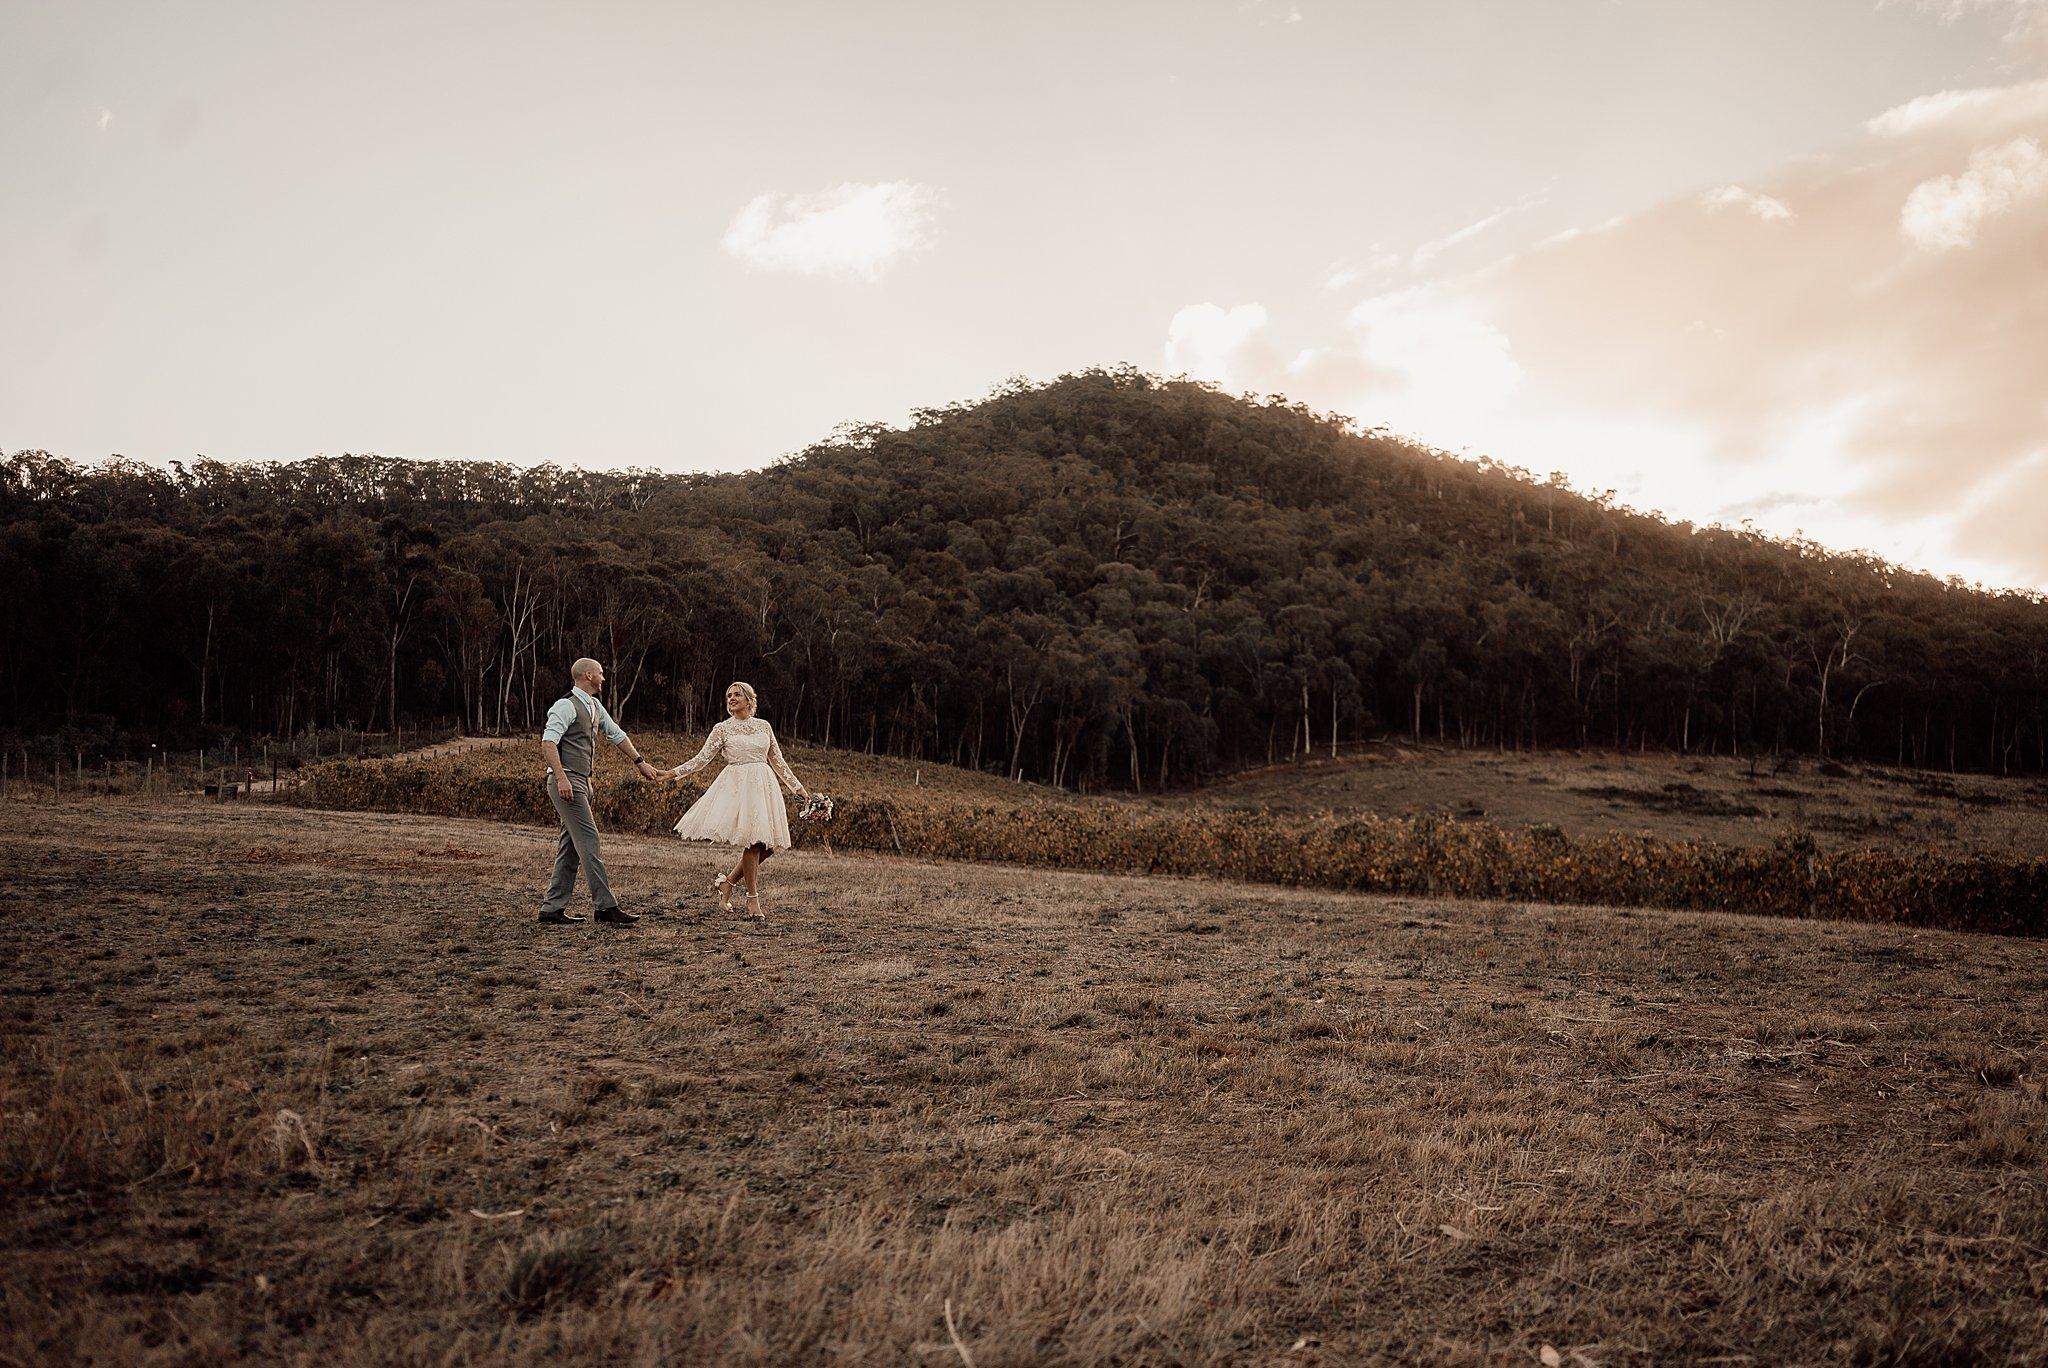 mickalathomas_puremacphotography_weddingphotographer_couplephotographer_Sheppartonphotographer_3466.jpg